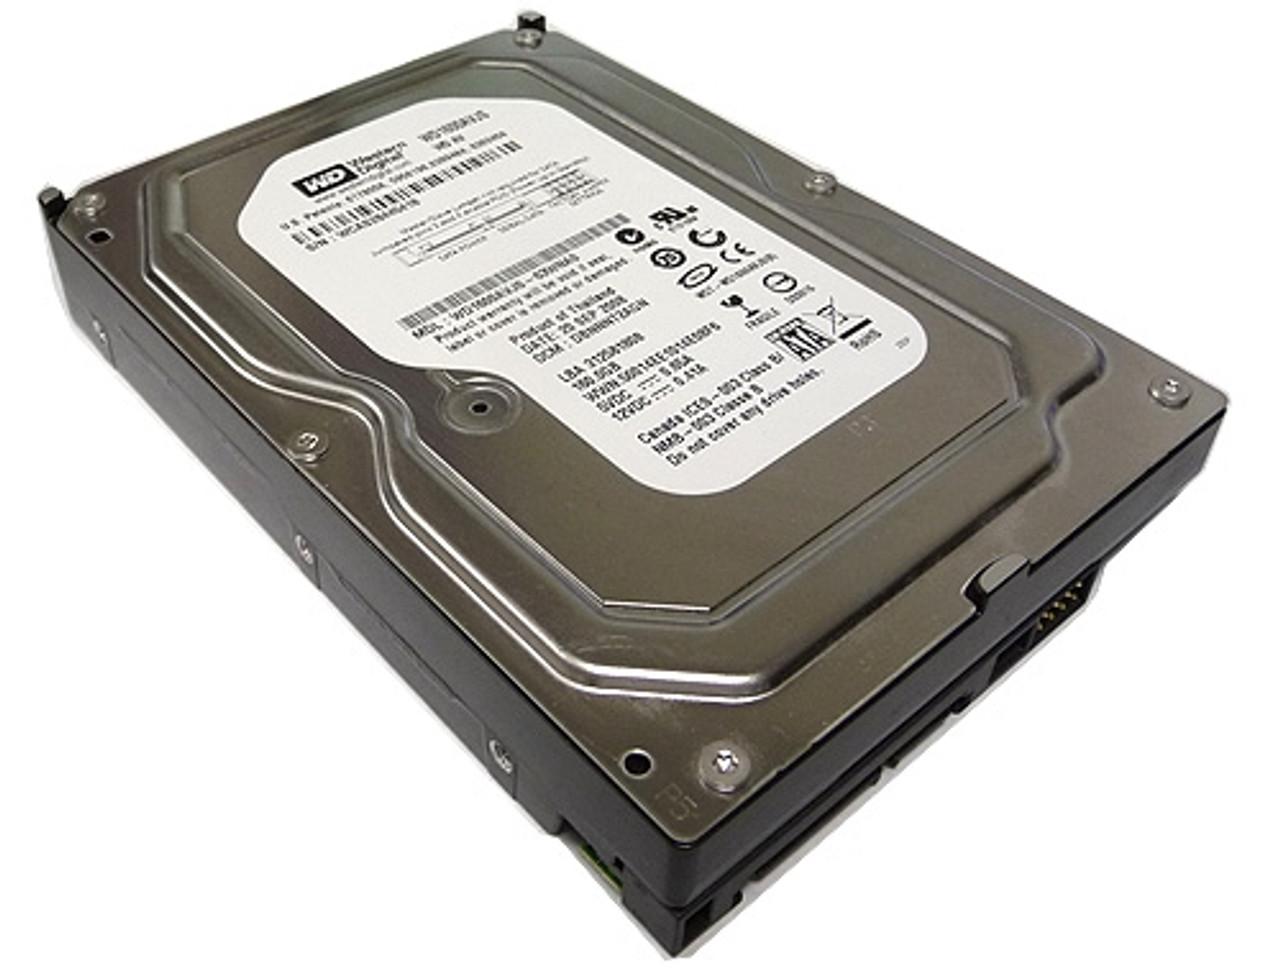 200GB Western Digital Internal Hard Drive